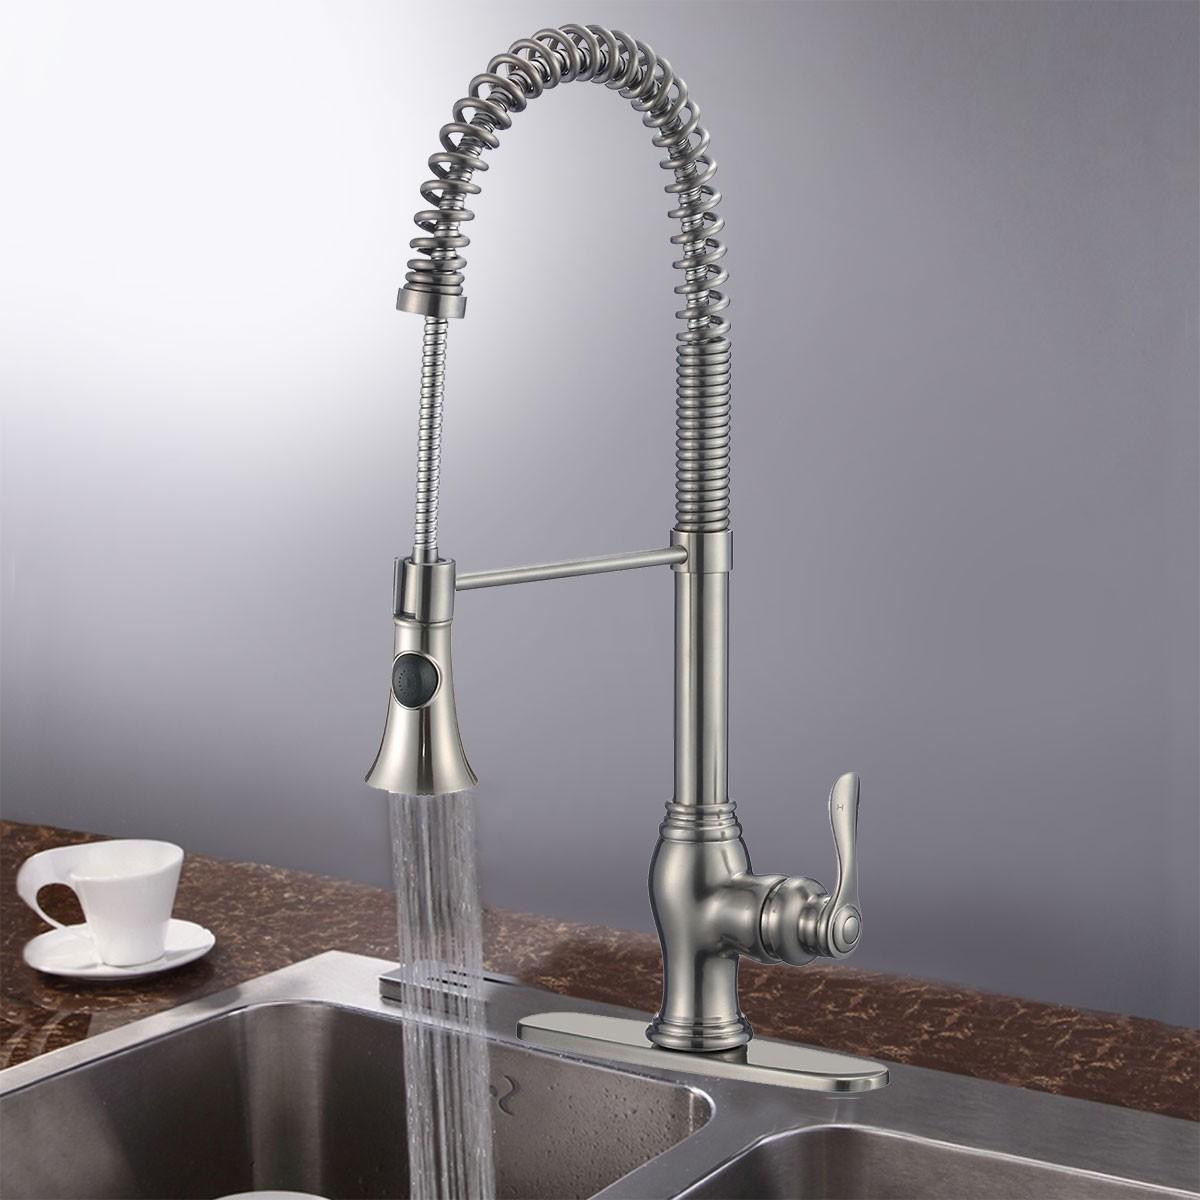 brushed nickel kitchen faucet with sprayer backsplash glass tile finished brass pull out